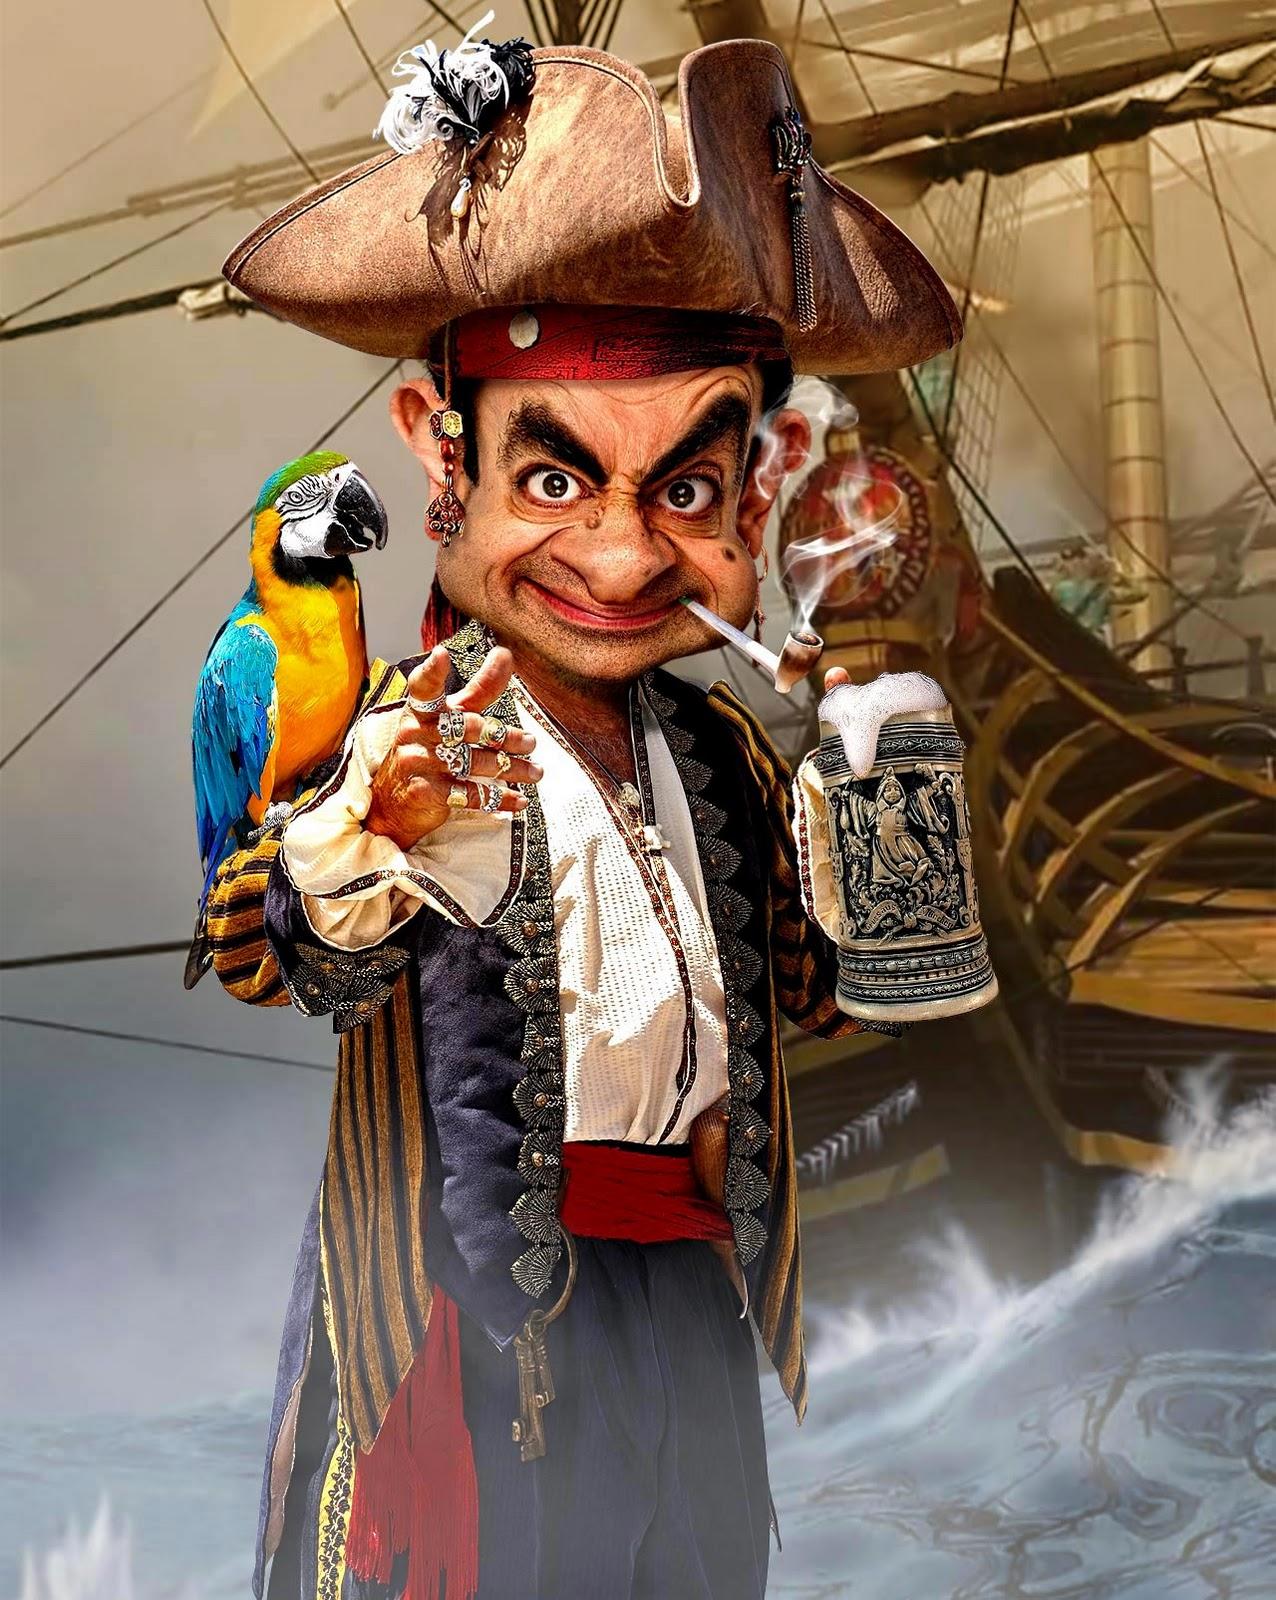 http://2.bp.blogspot.com/-l95ThLl27yE/TlbnxZsd5VI/AAAAAAAAJas/YsXOc1HZkZw/s1600/Pirate_Bean.jpg